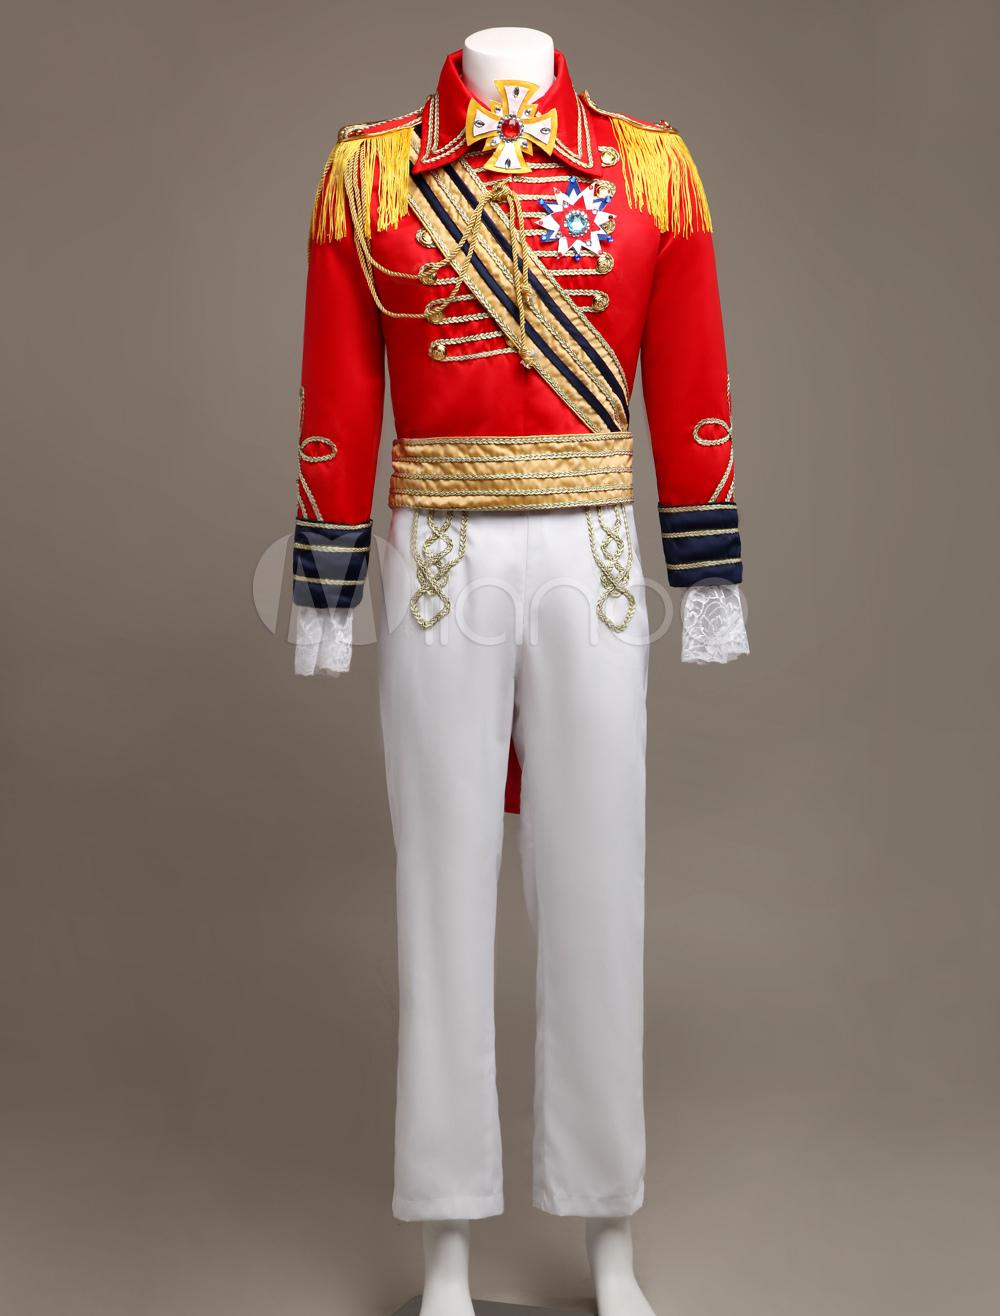 Royal Retro Costume Men S Red European Vintage Prince